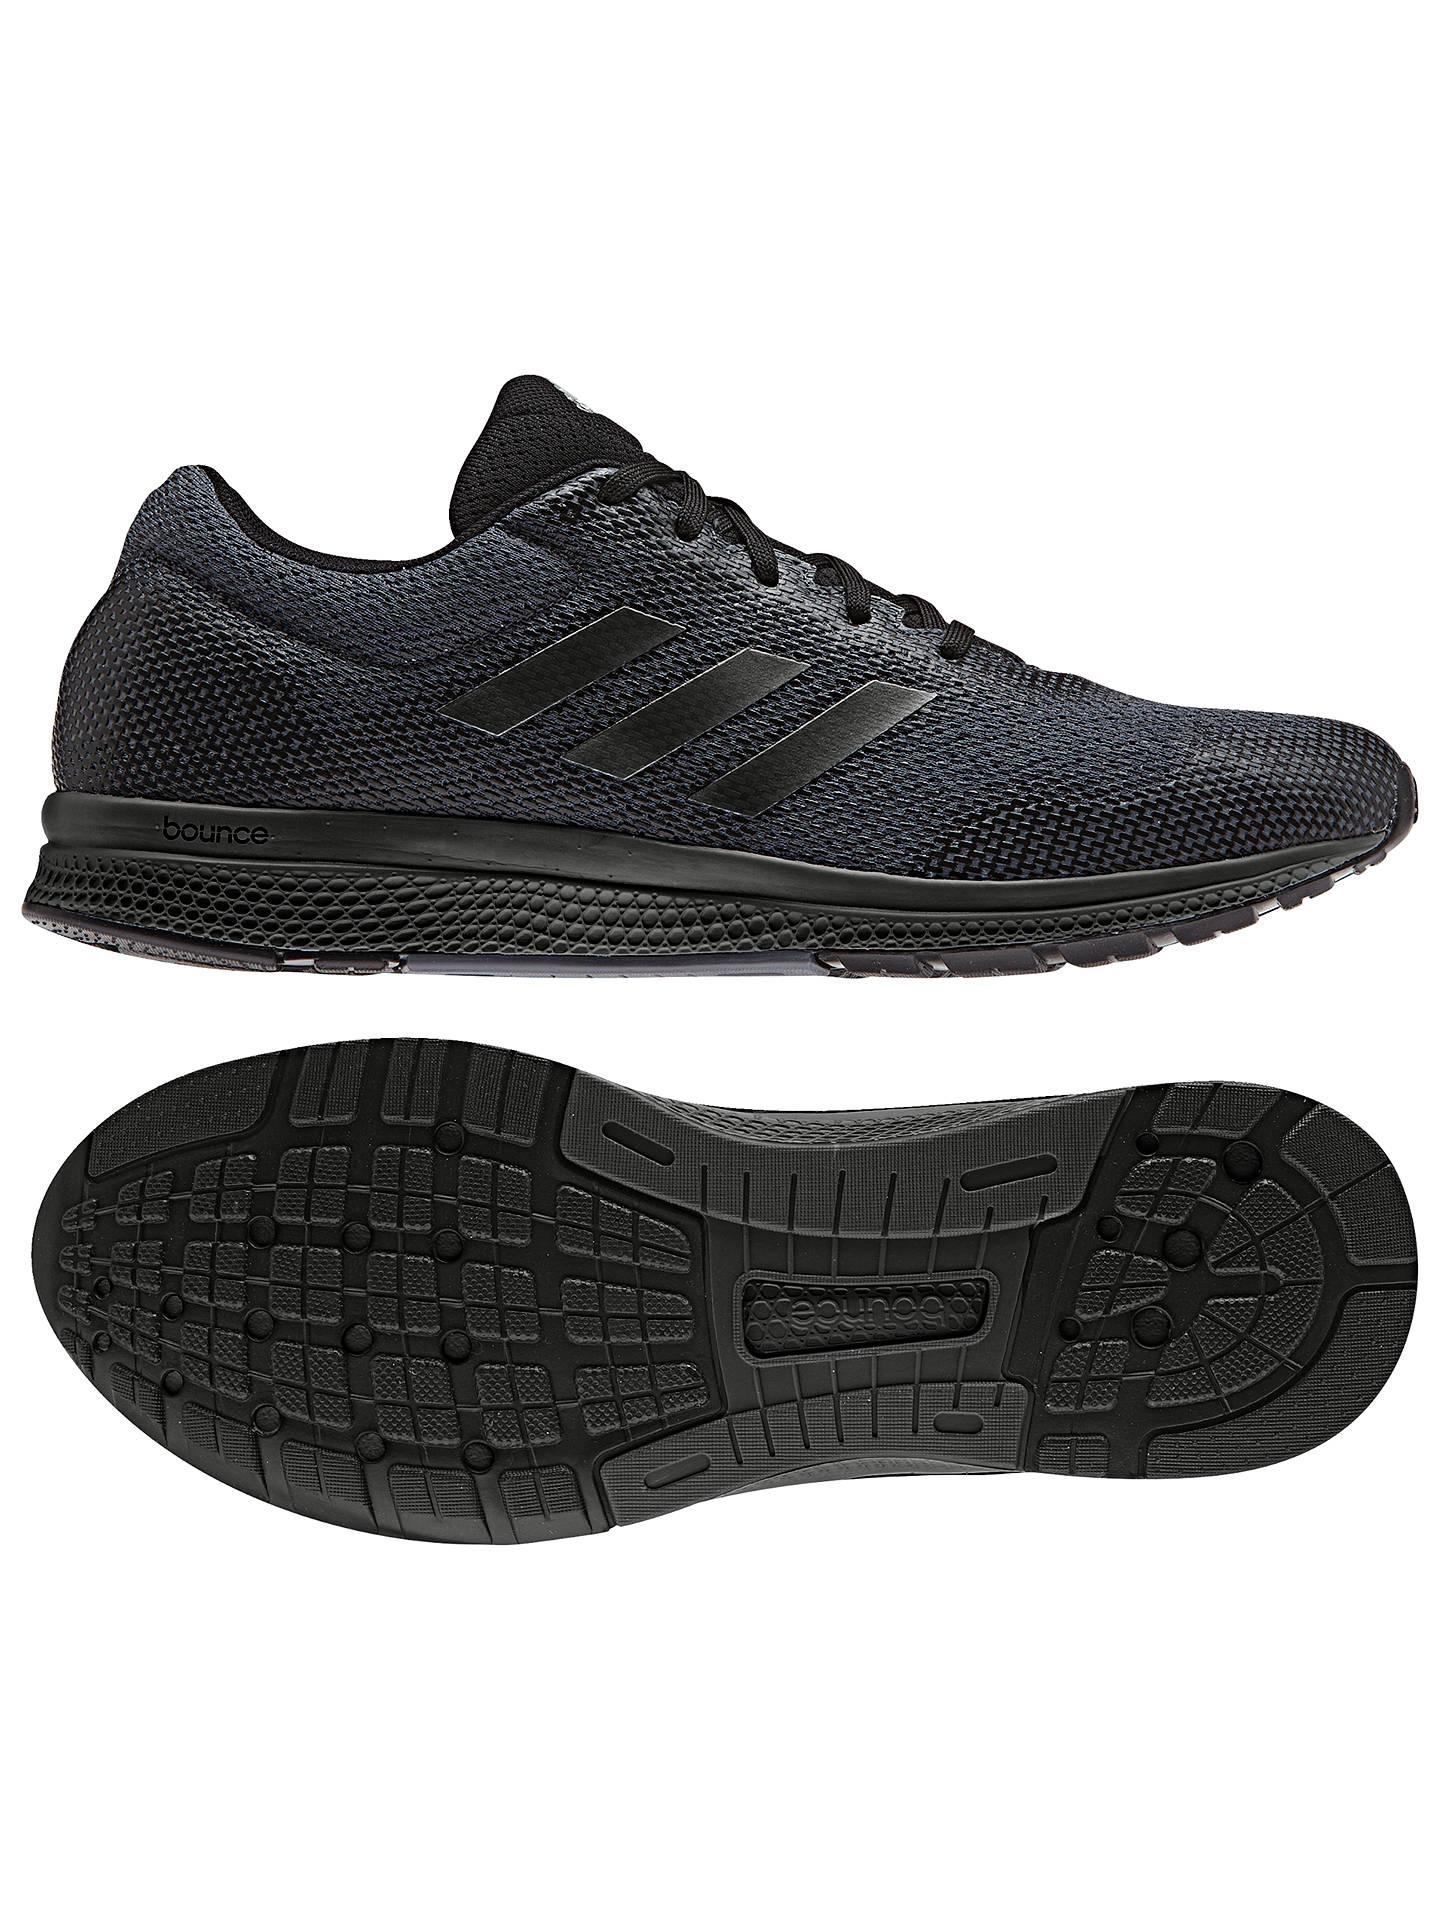 06a14c8c153f9 ... Buy adidas Mana Bounce 2.0 Men s Running Shoes